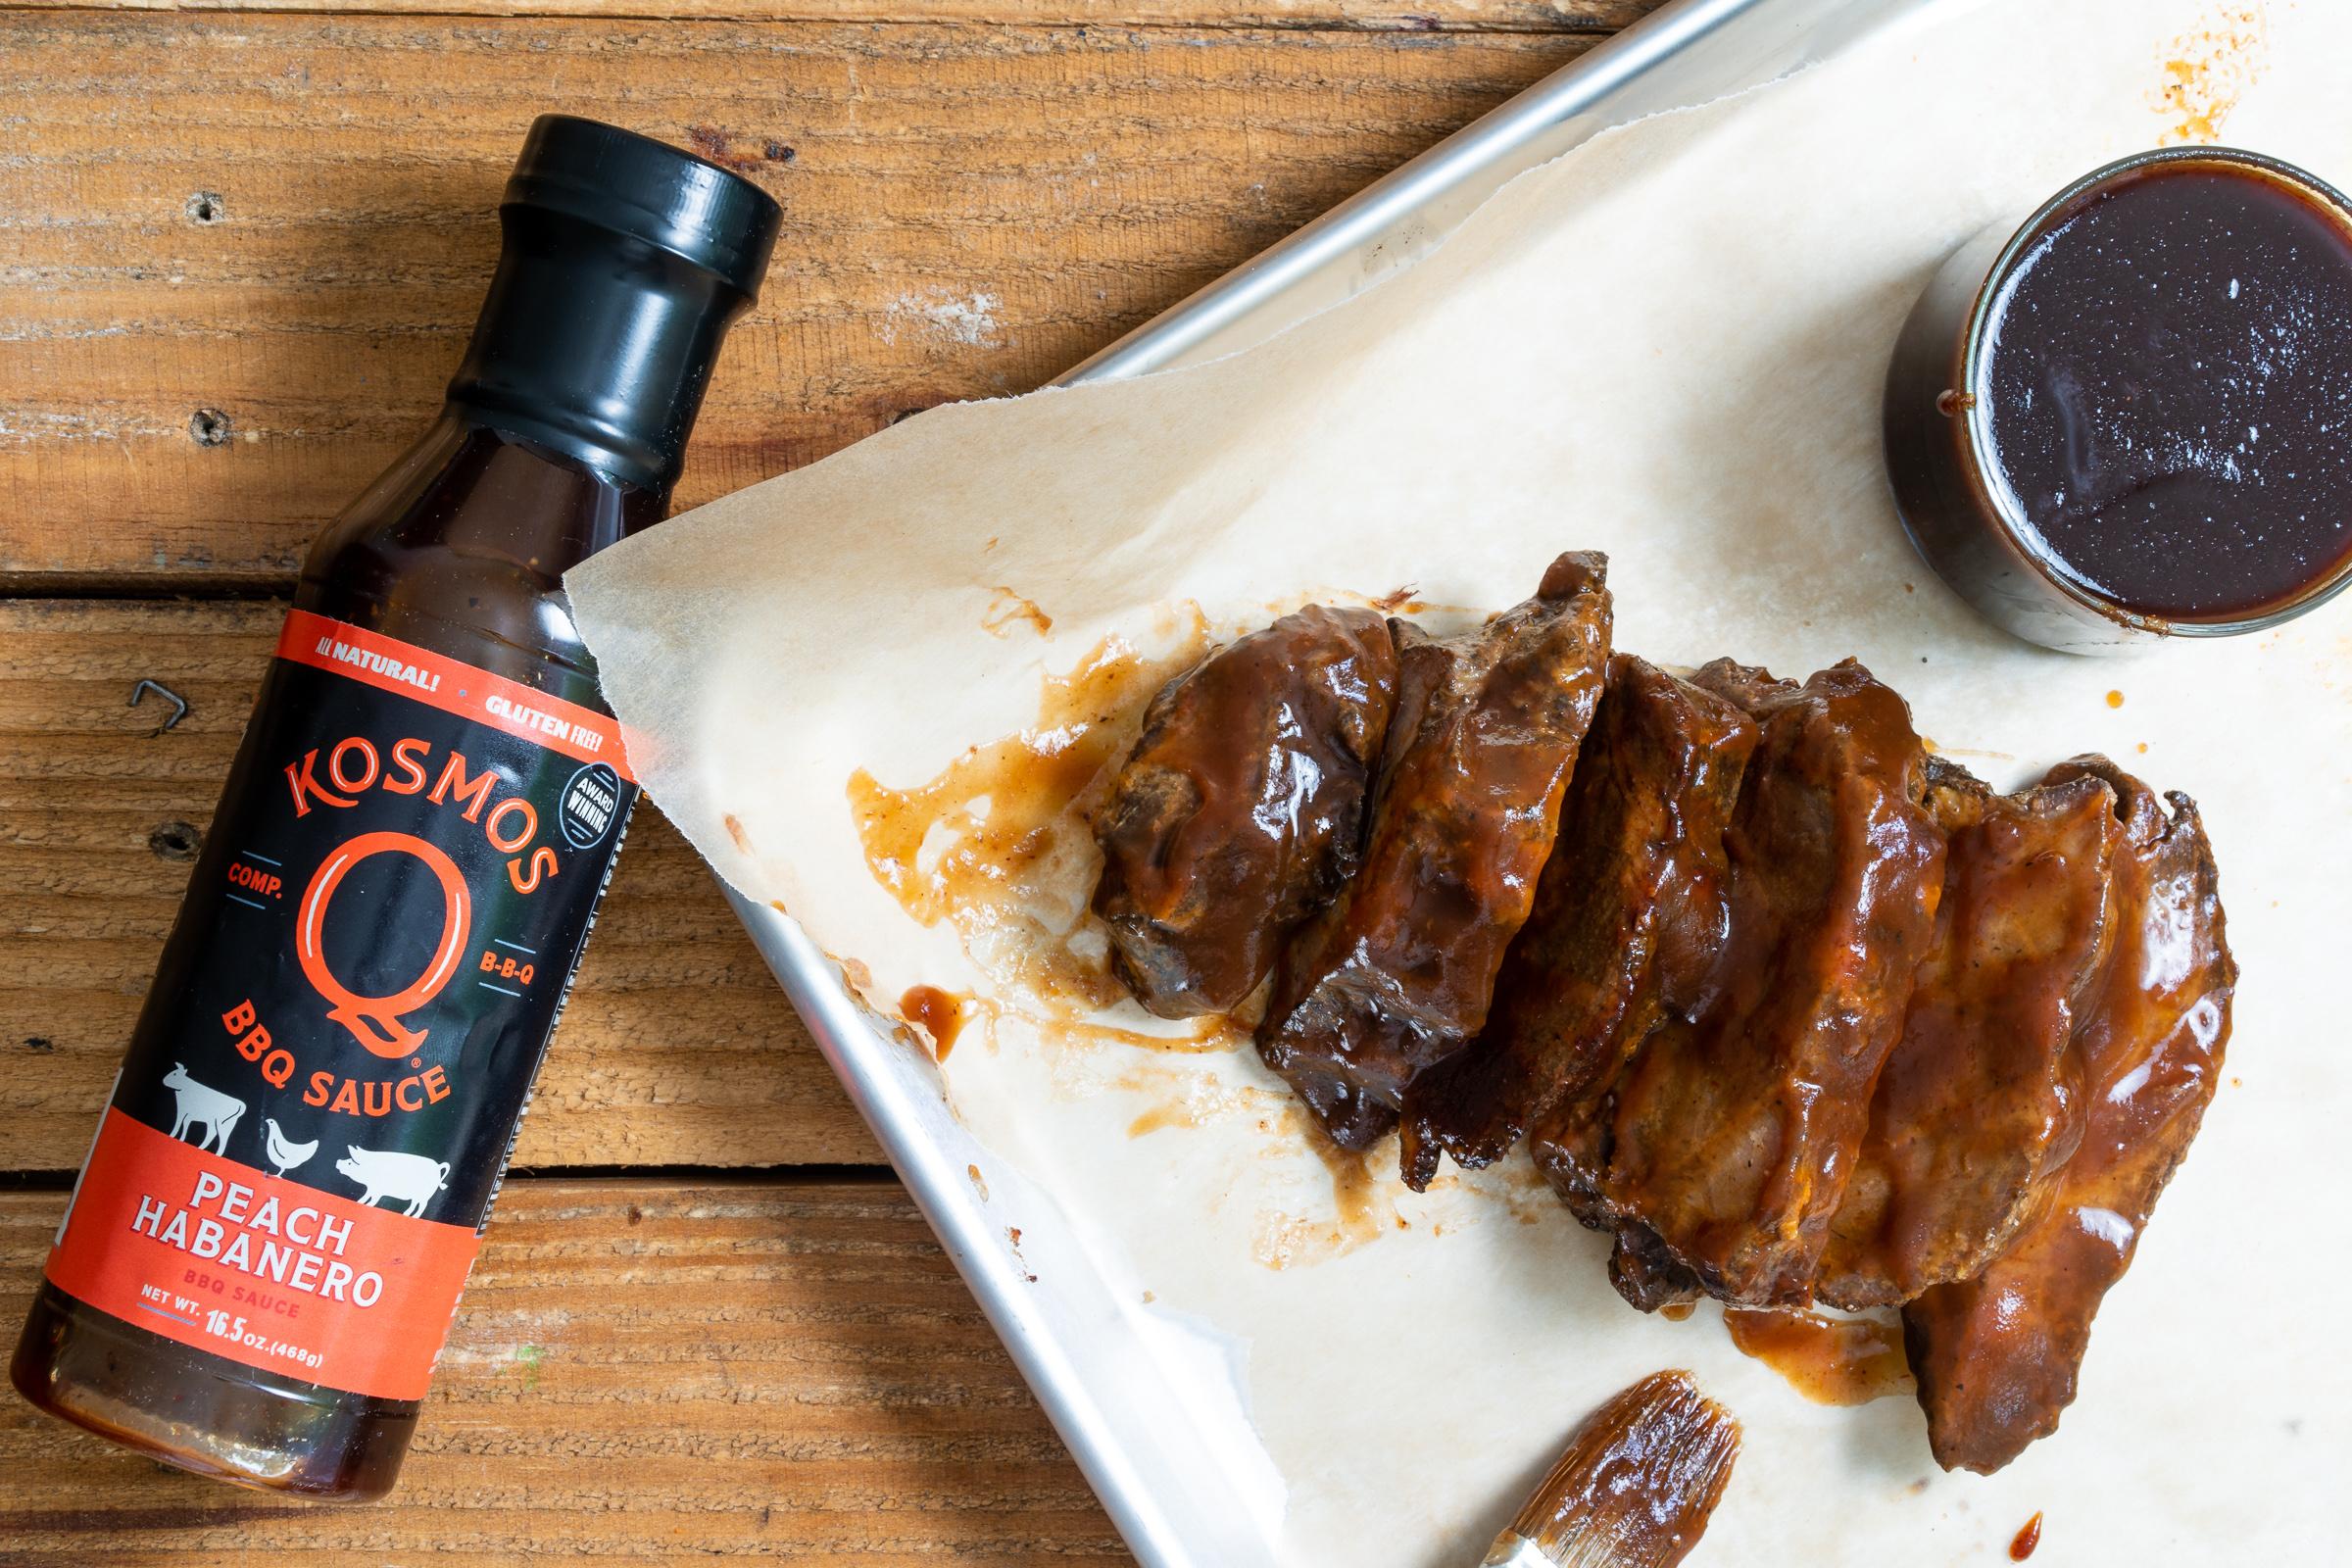 kosmos bbq sauce jeremy pawlowski portland oregon texas food photographer photography restaurant meat